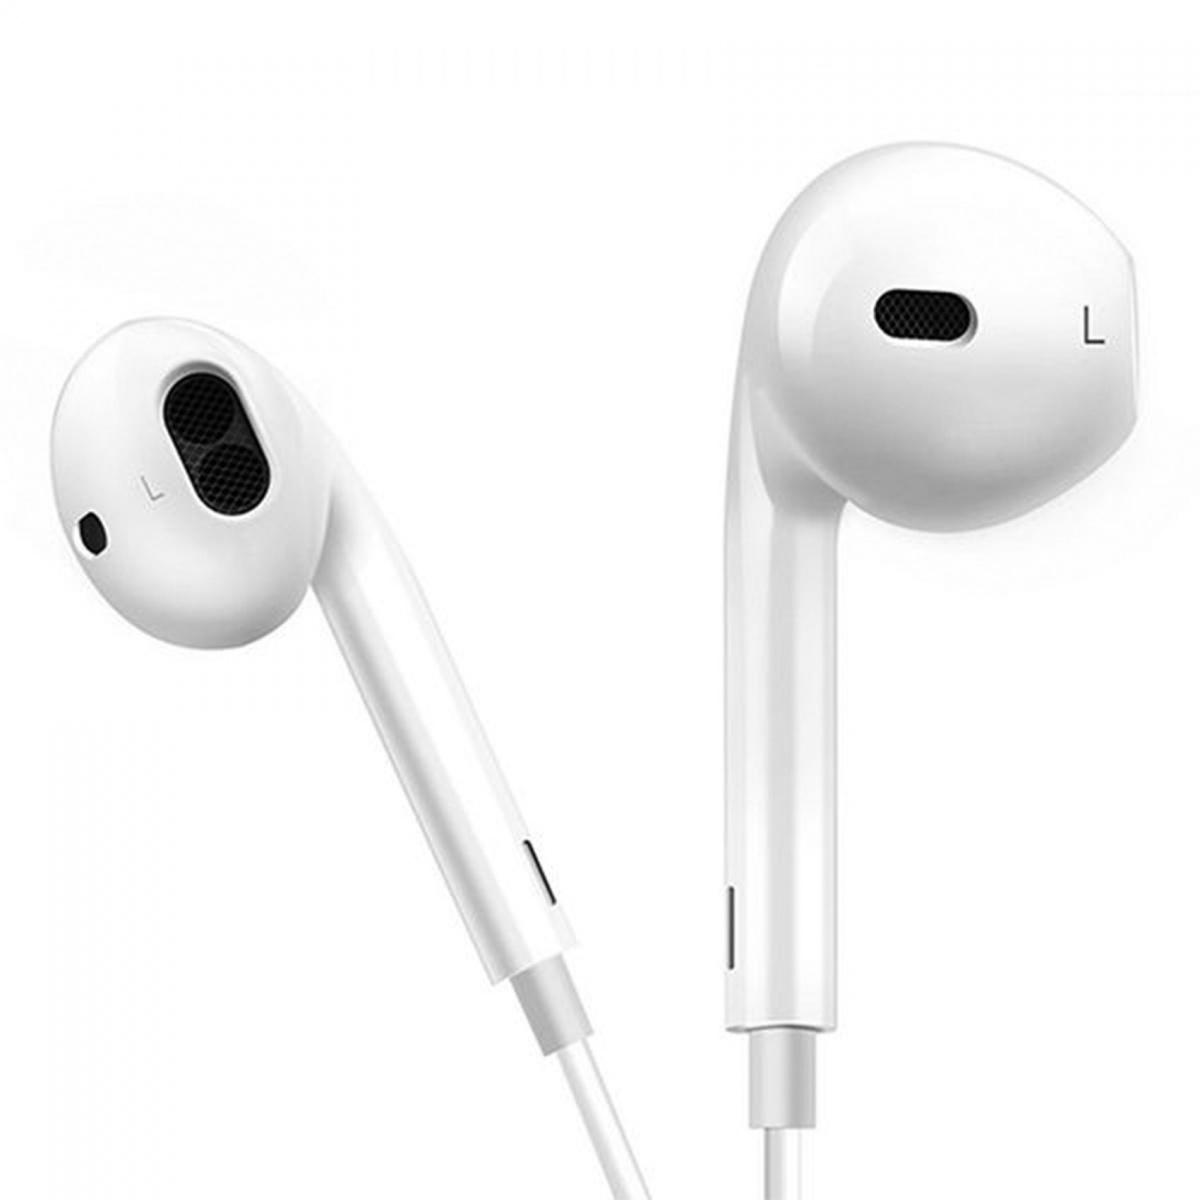 S31 XO Wired Earphone - White